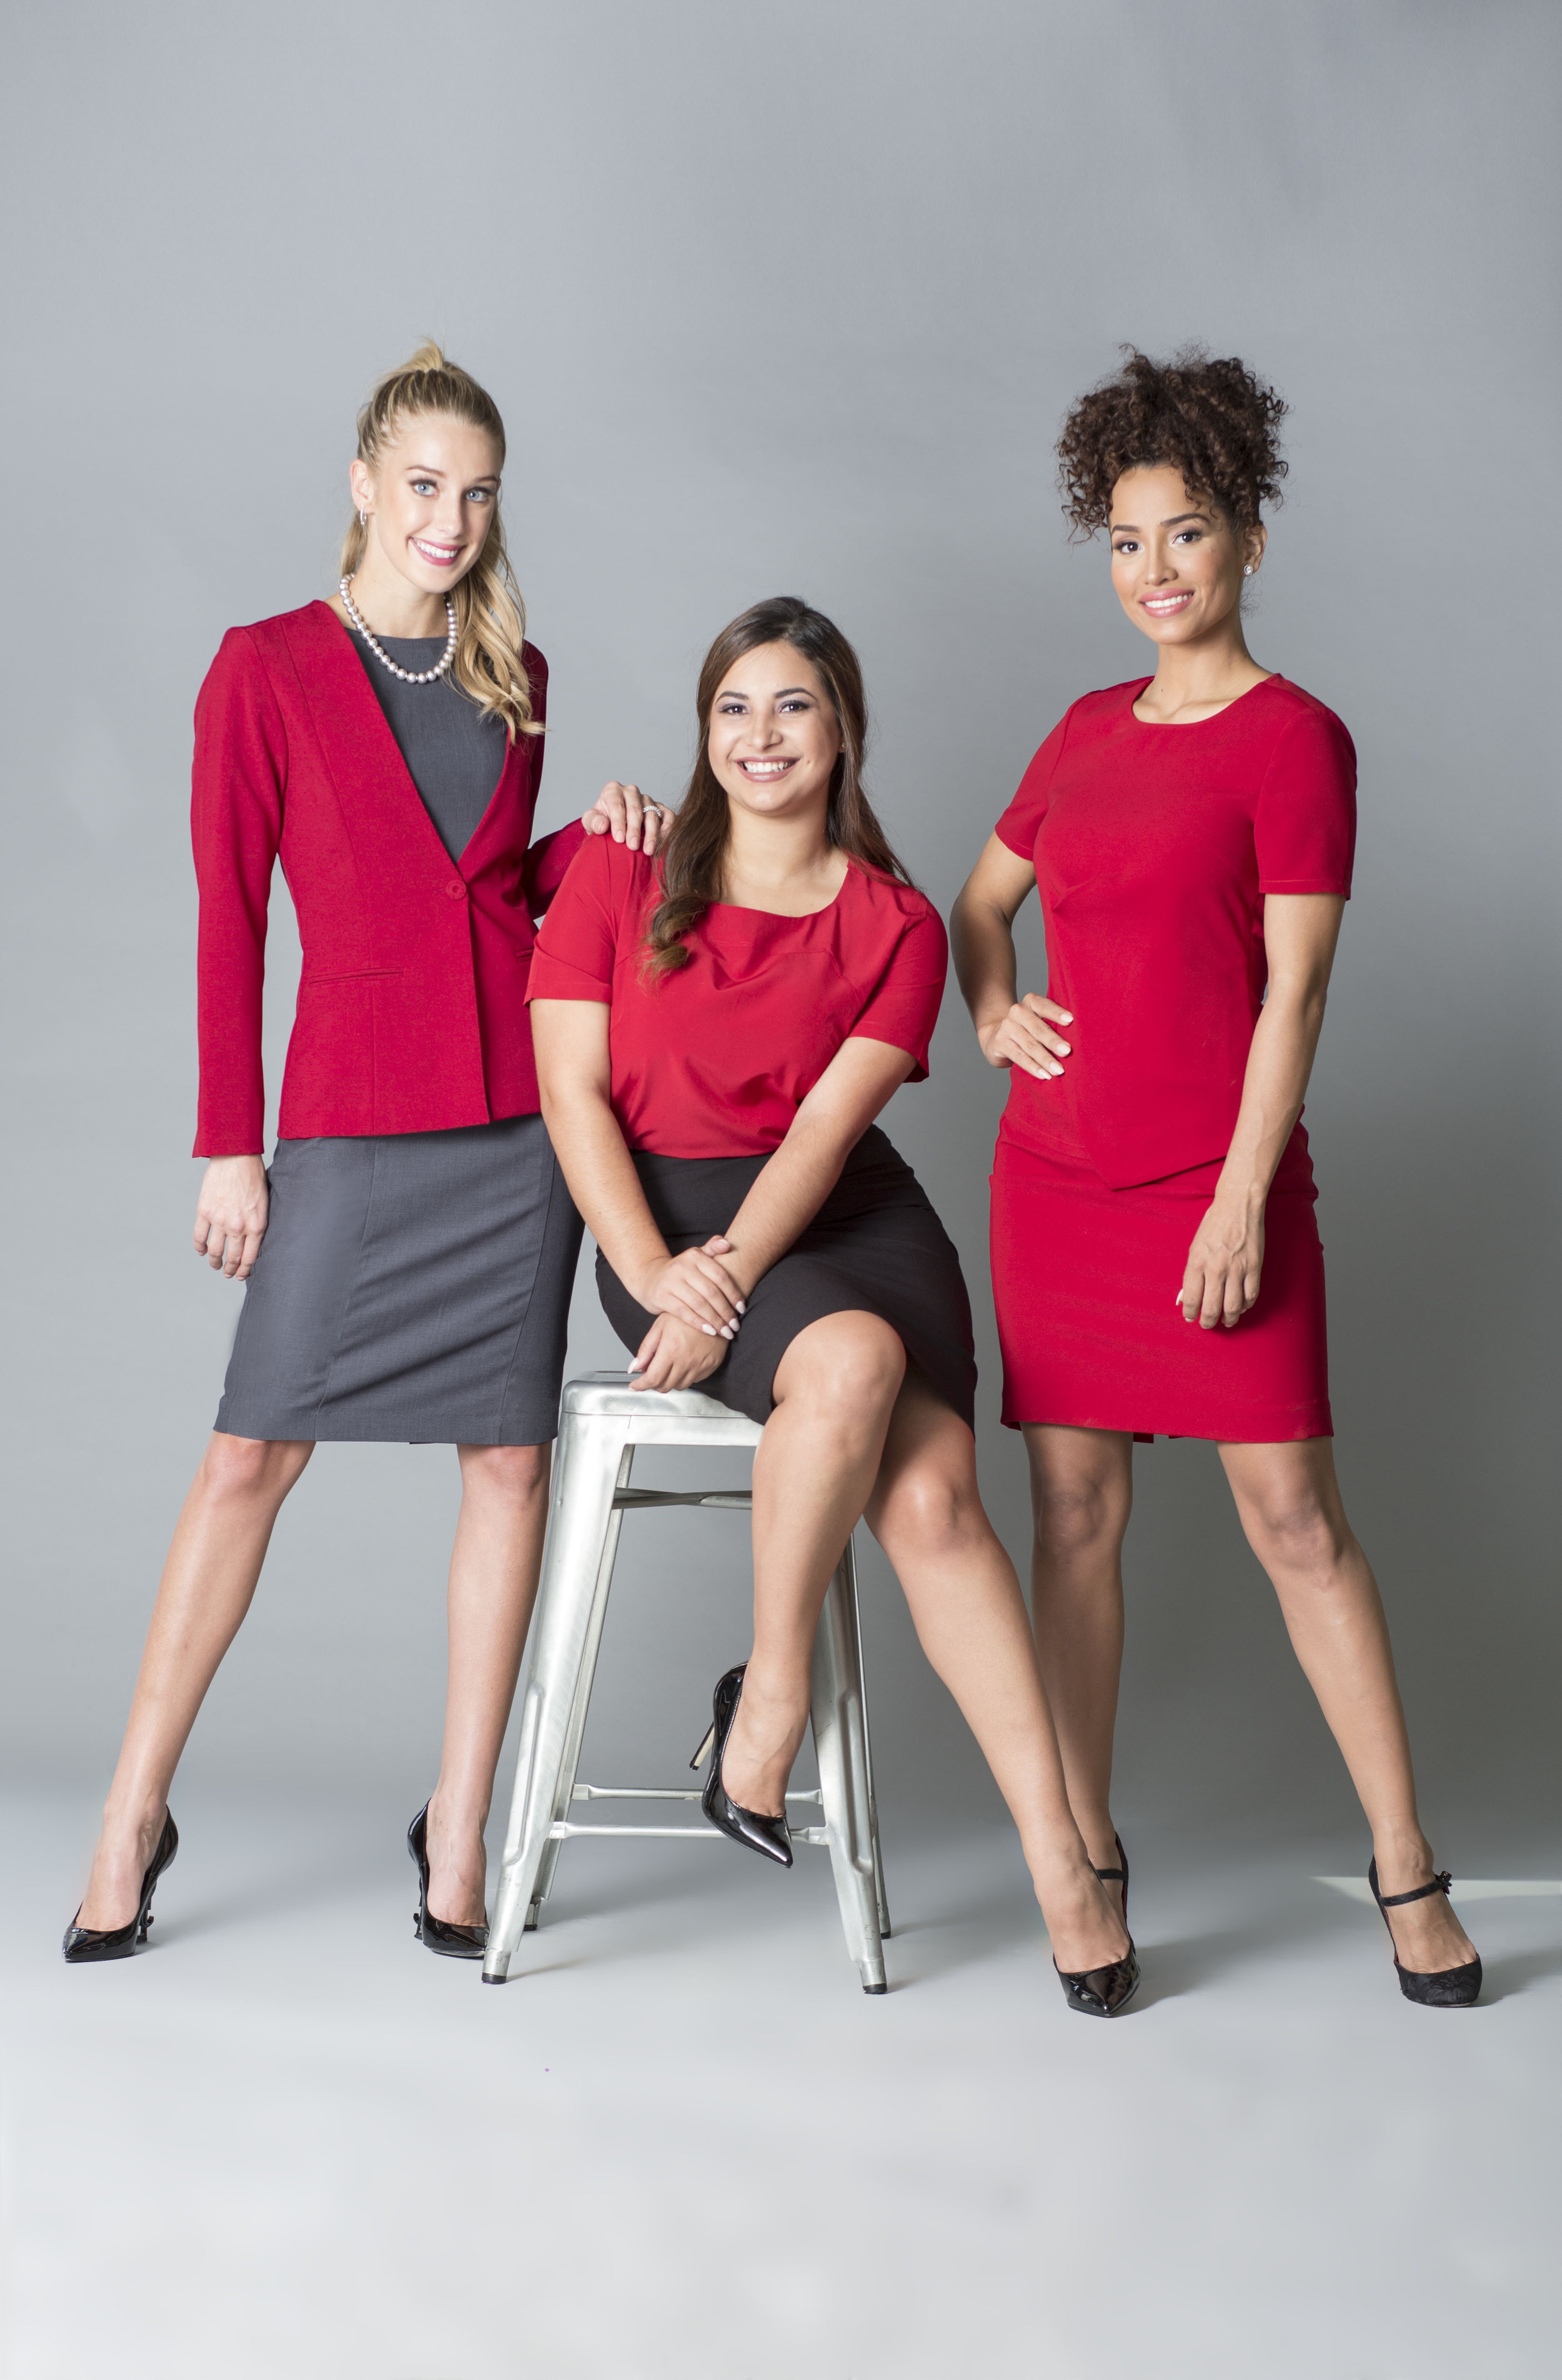 3 modelos de rojo copy.jpg